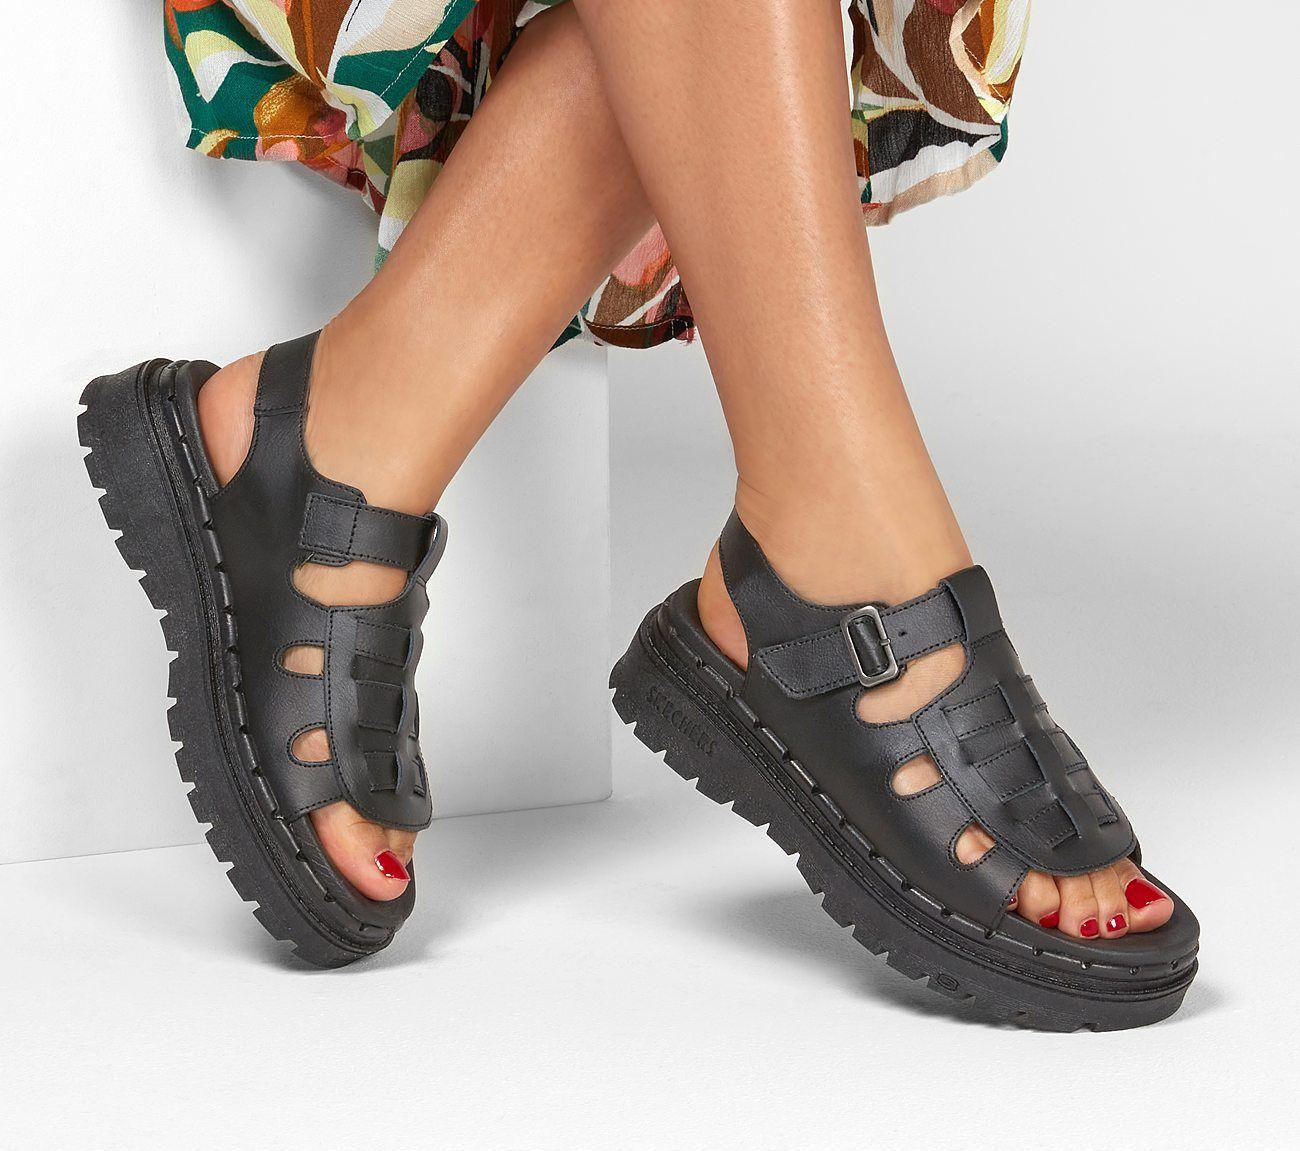 shoes, Strap heels